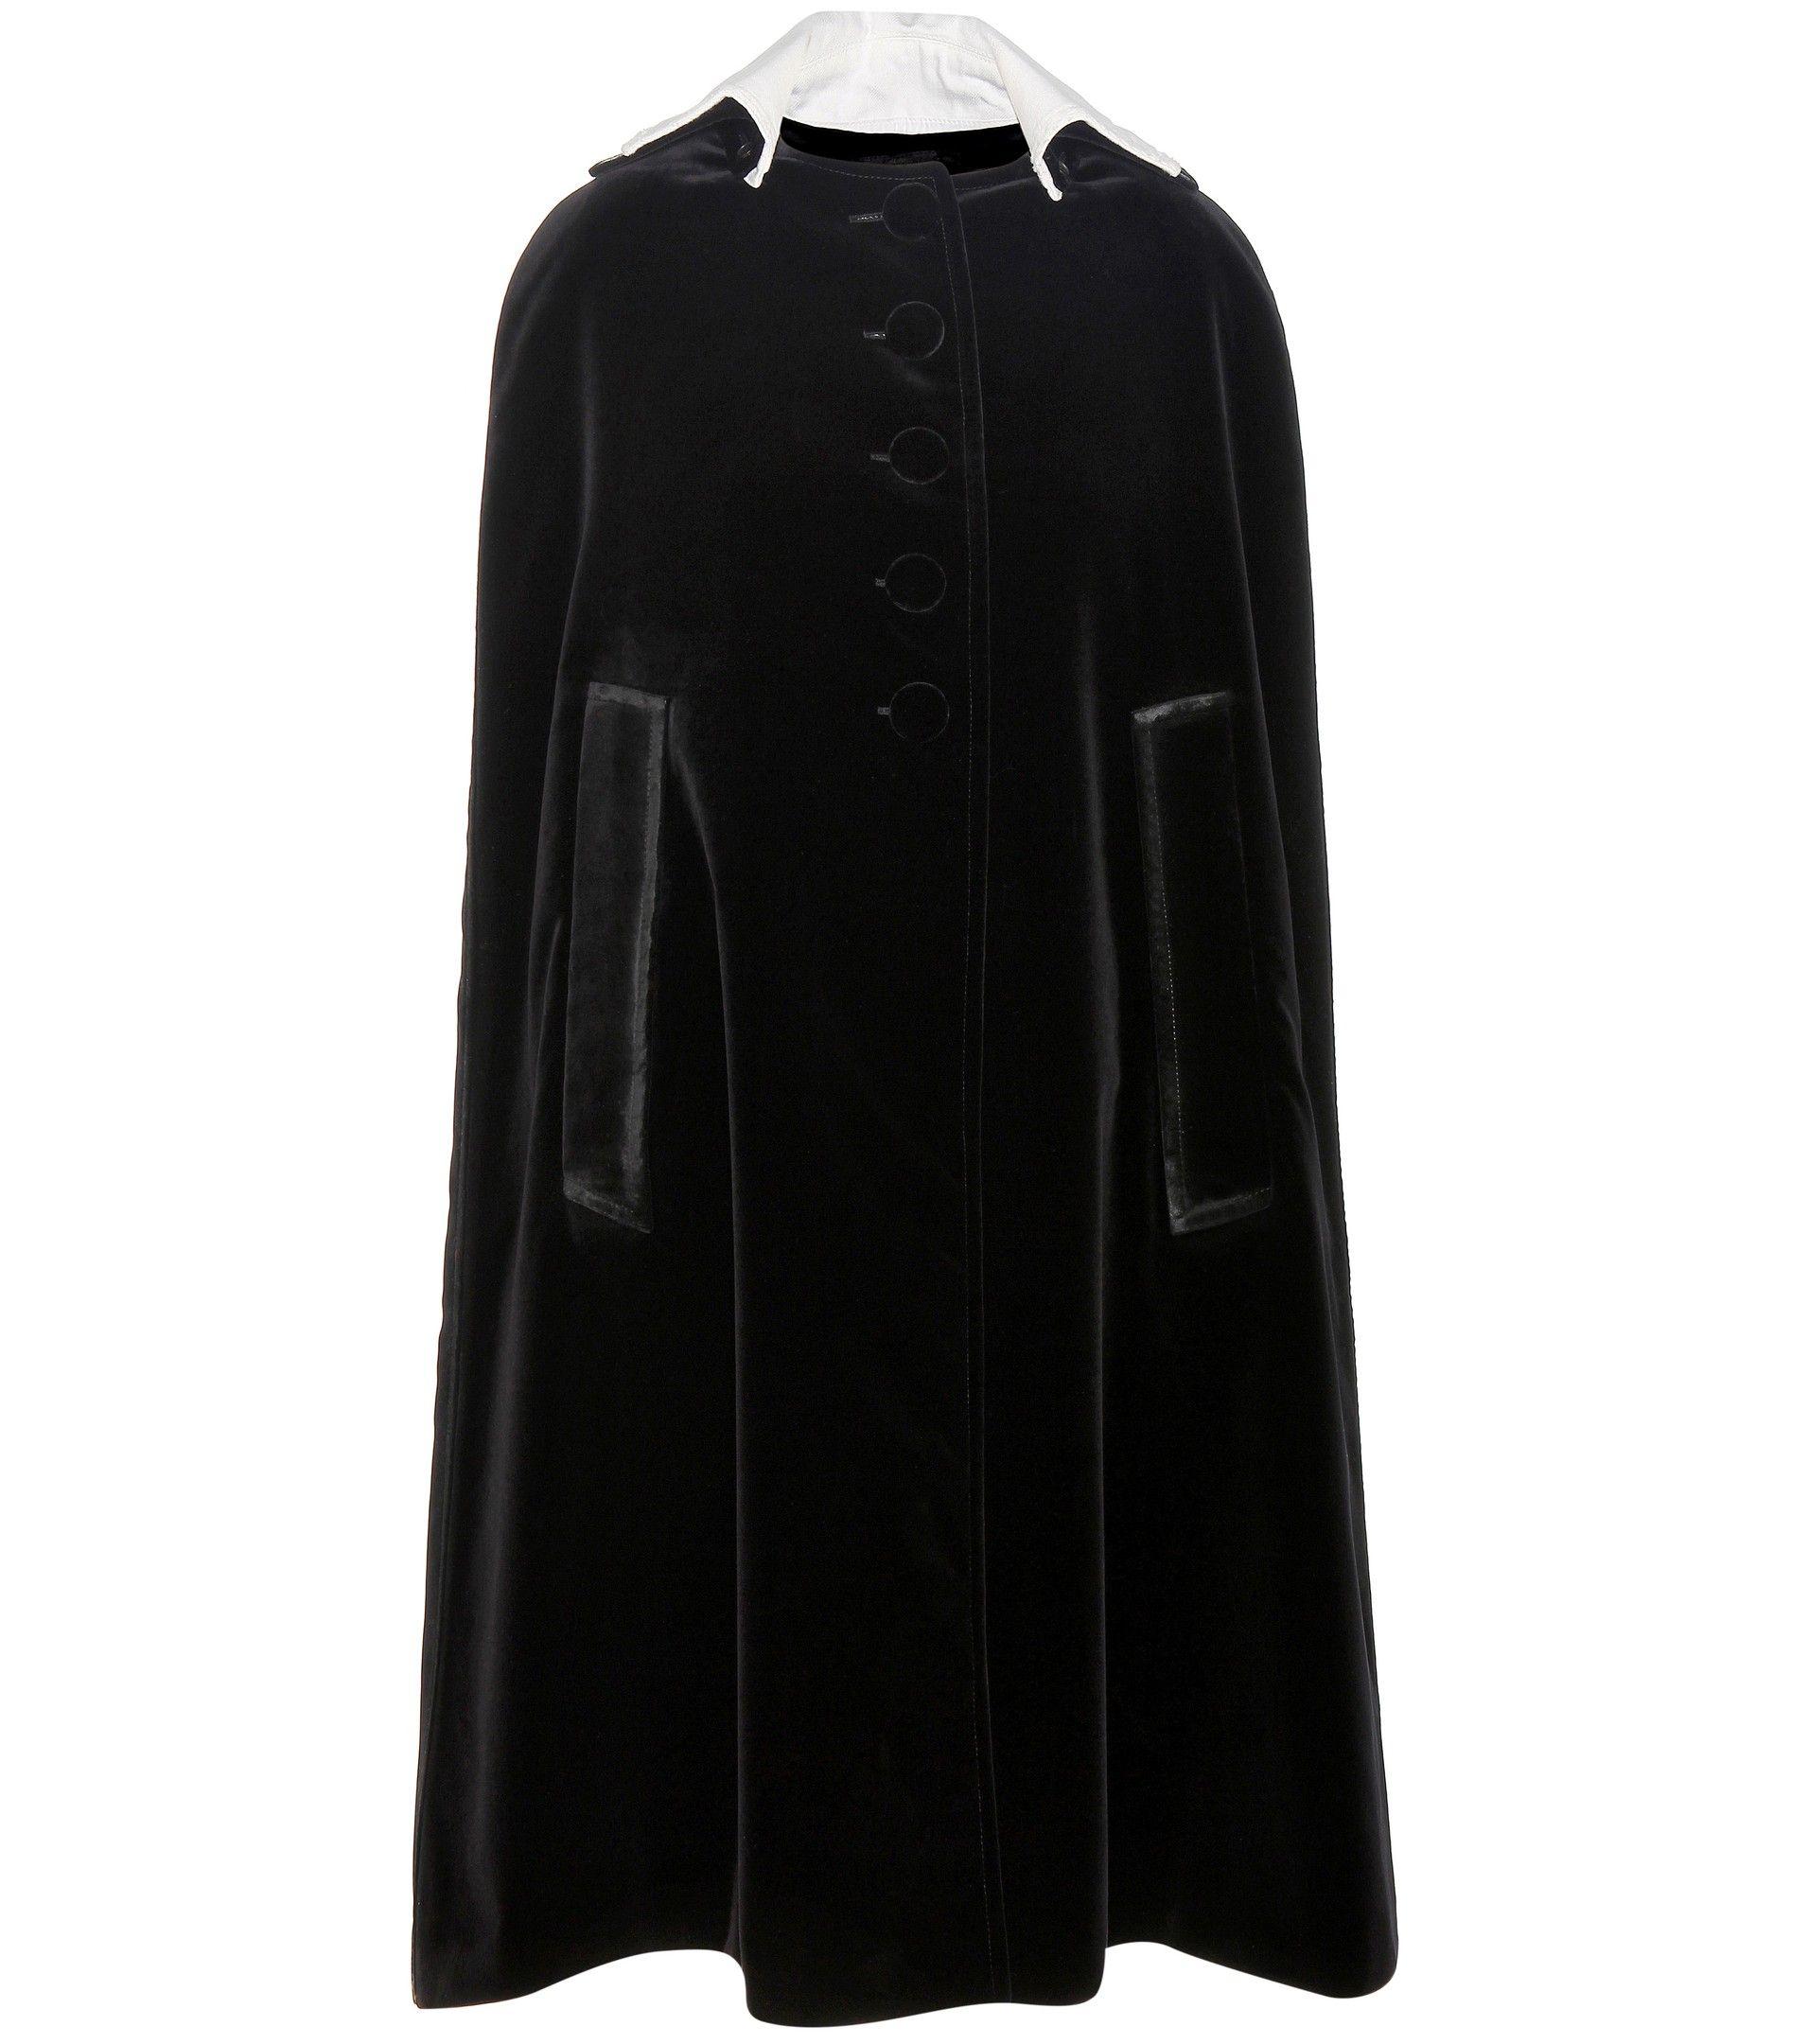 mytheresa.com - Velvet cape - Luxury Fashion for Women / Designer clothing, shoes, bags